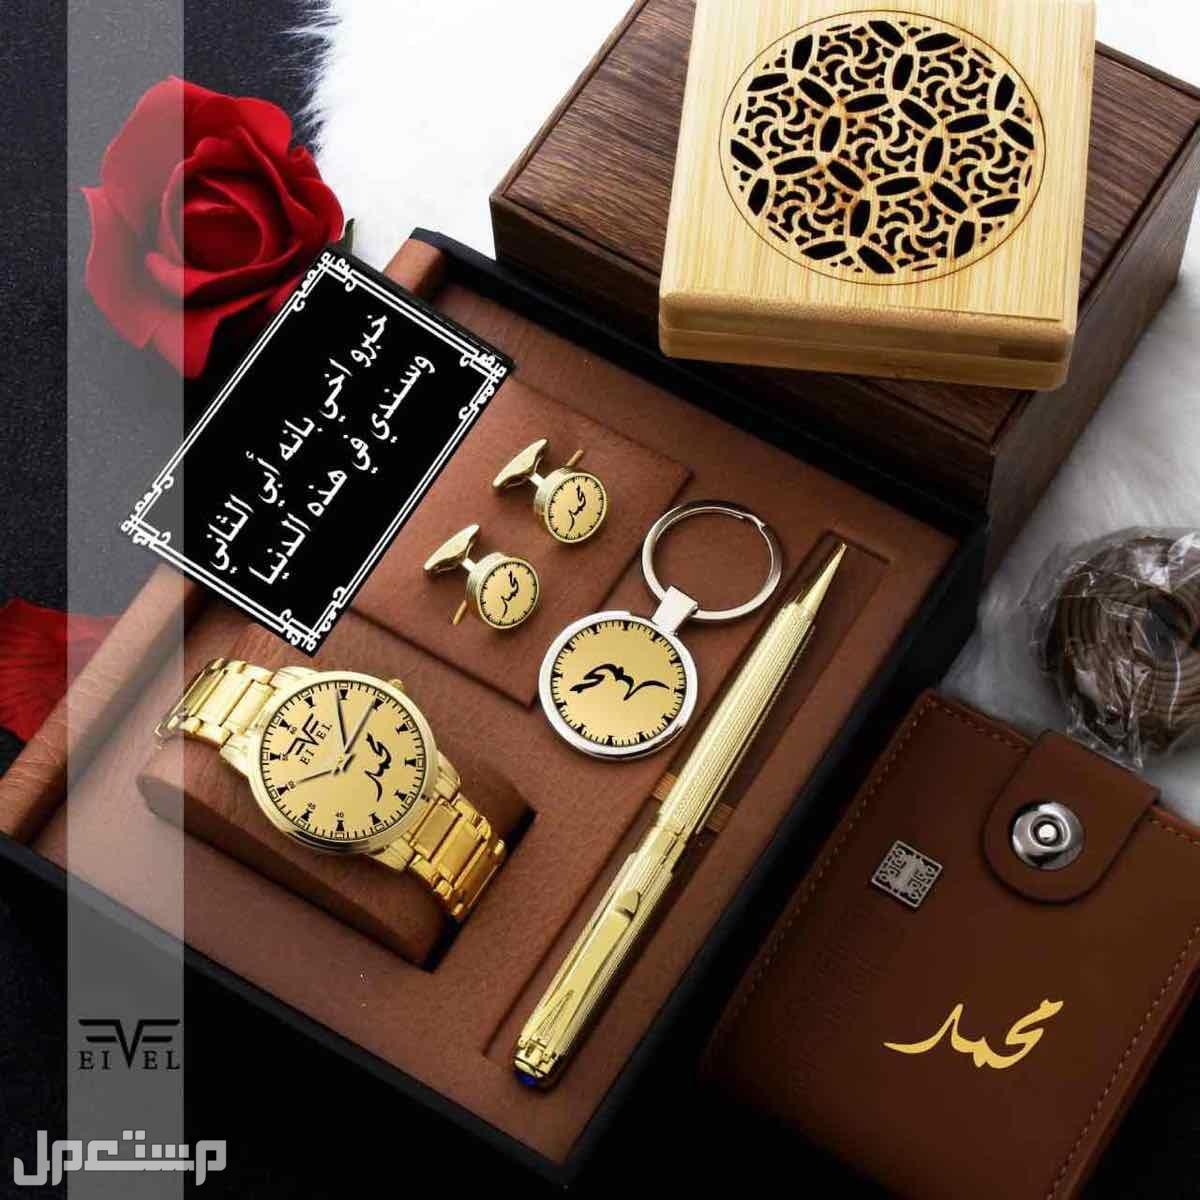 طقم رجالي ساعه قلم كبك ميداليه خاتم عطر مبخره تصميم بالطلب